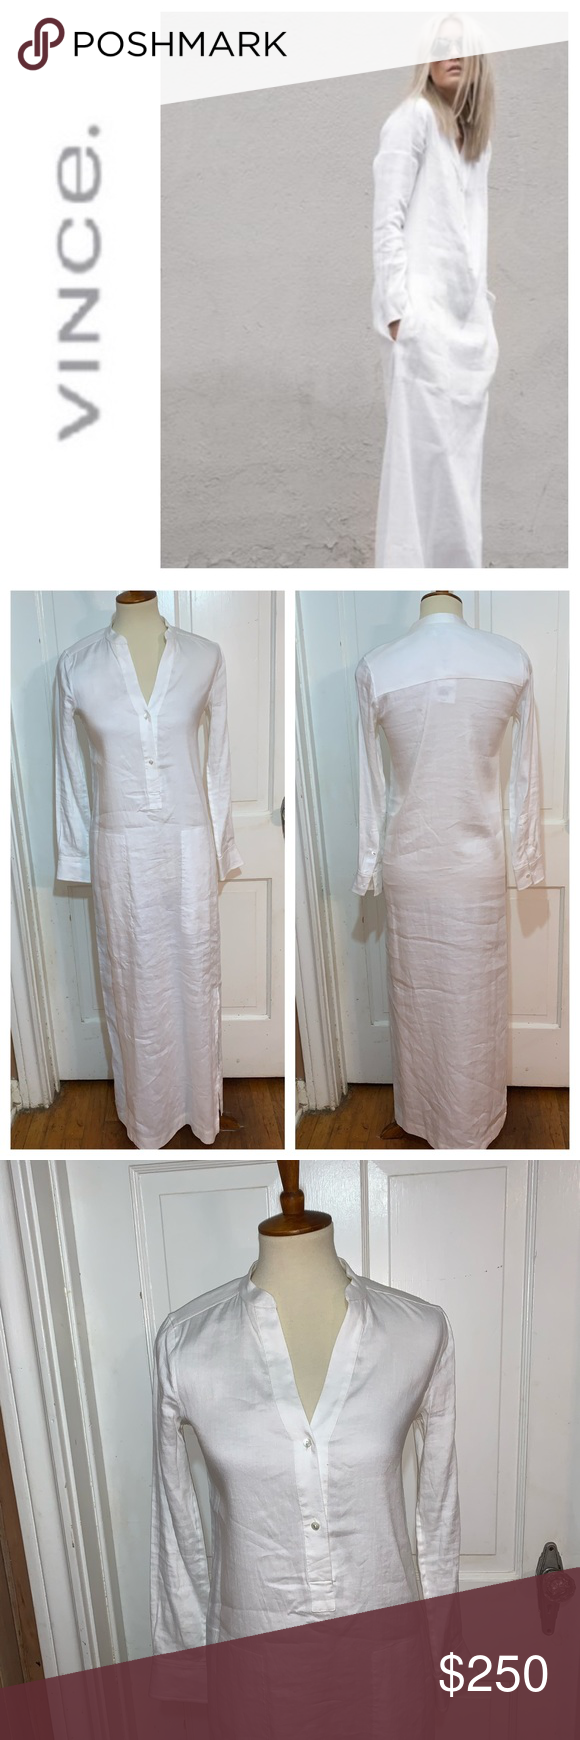 Nwt Vince White Linen Caftan Dress Size S White Linen Maxi Dress Linen Maxi Dress Clothes Design [ 1740 x 580 Pixel ]